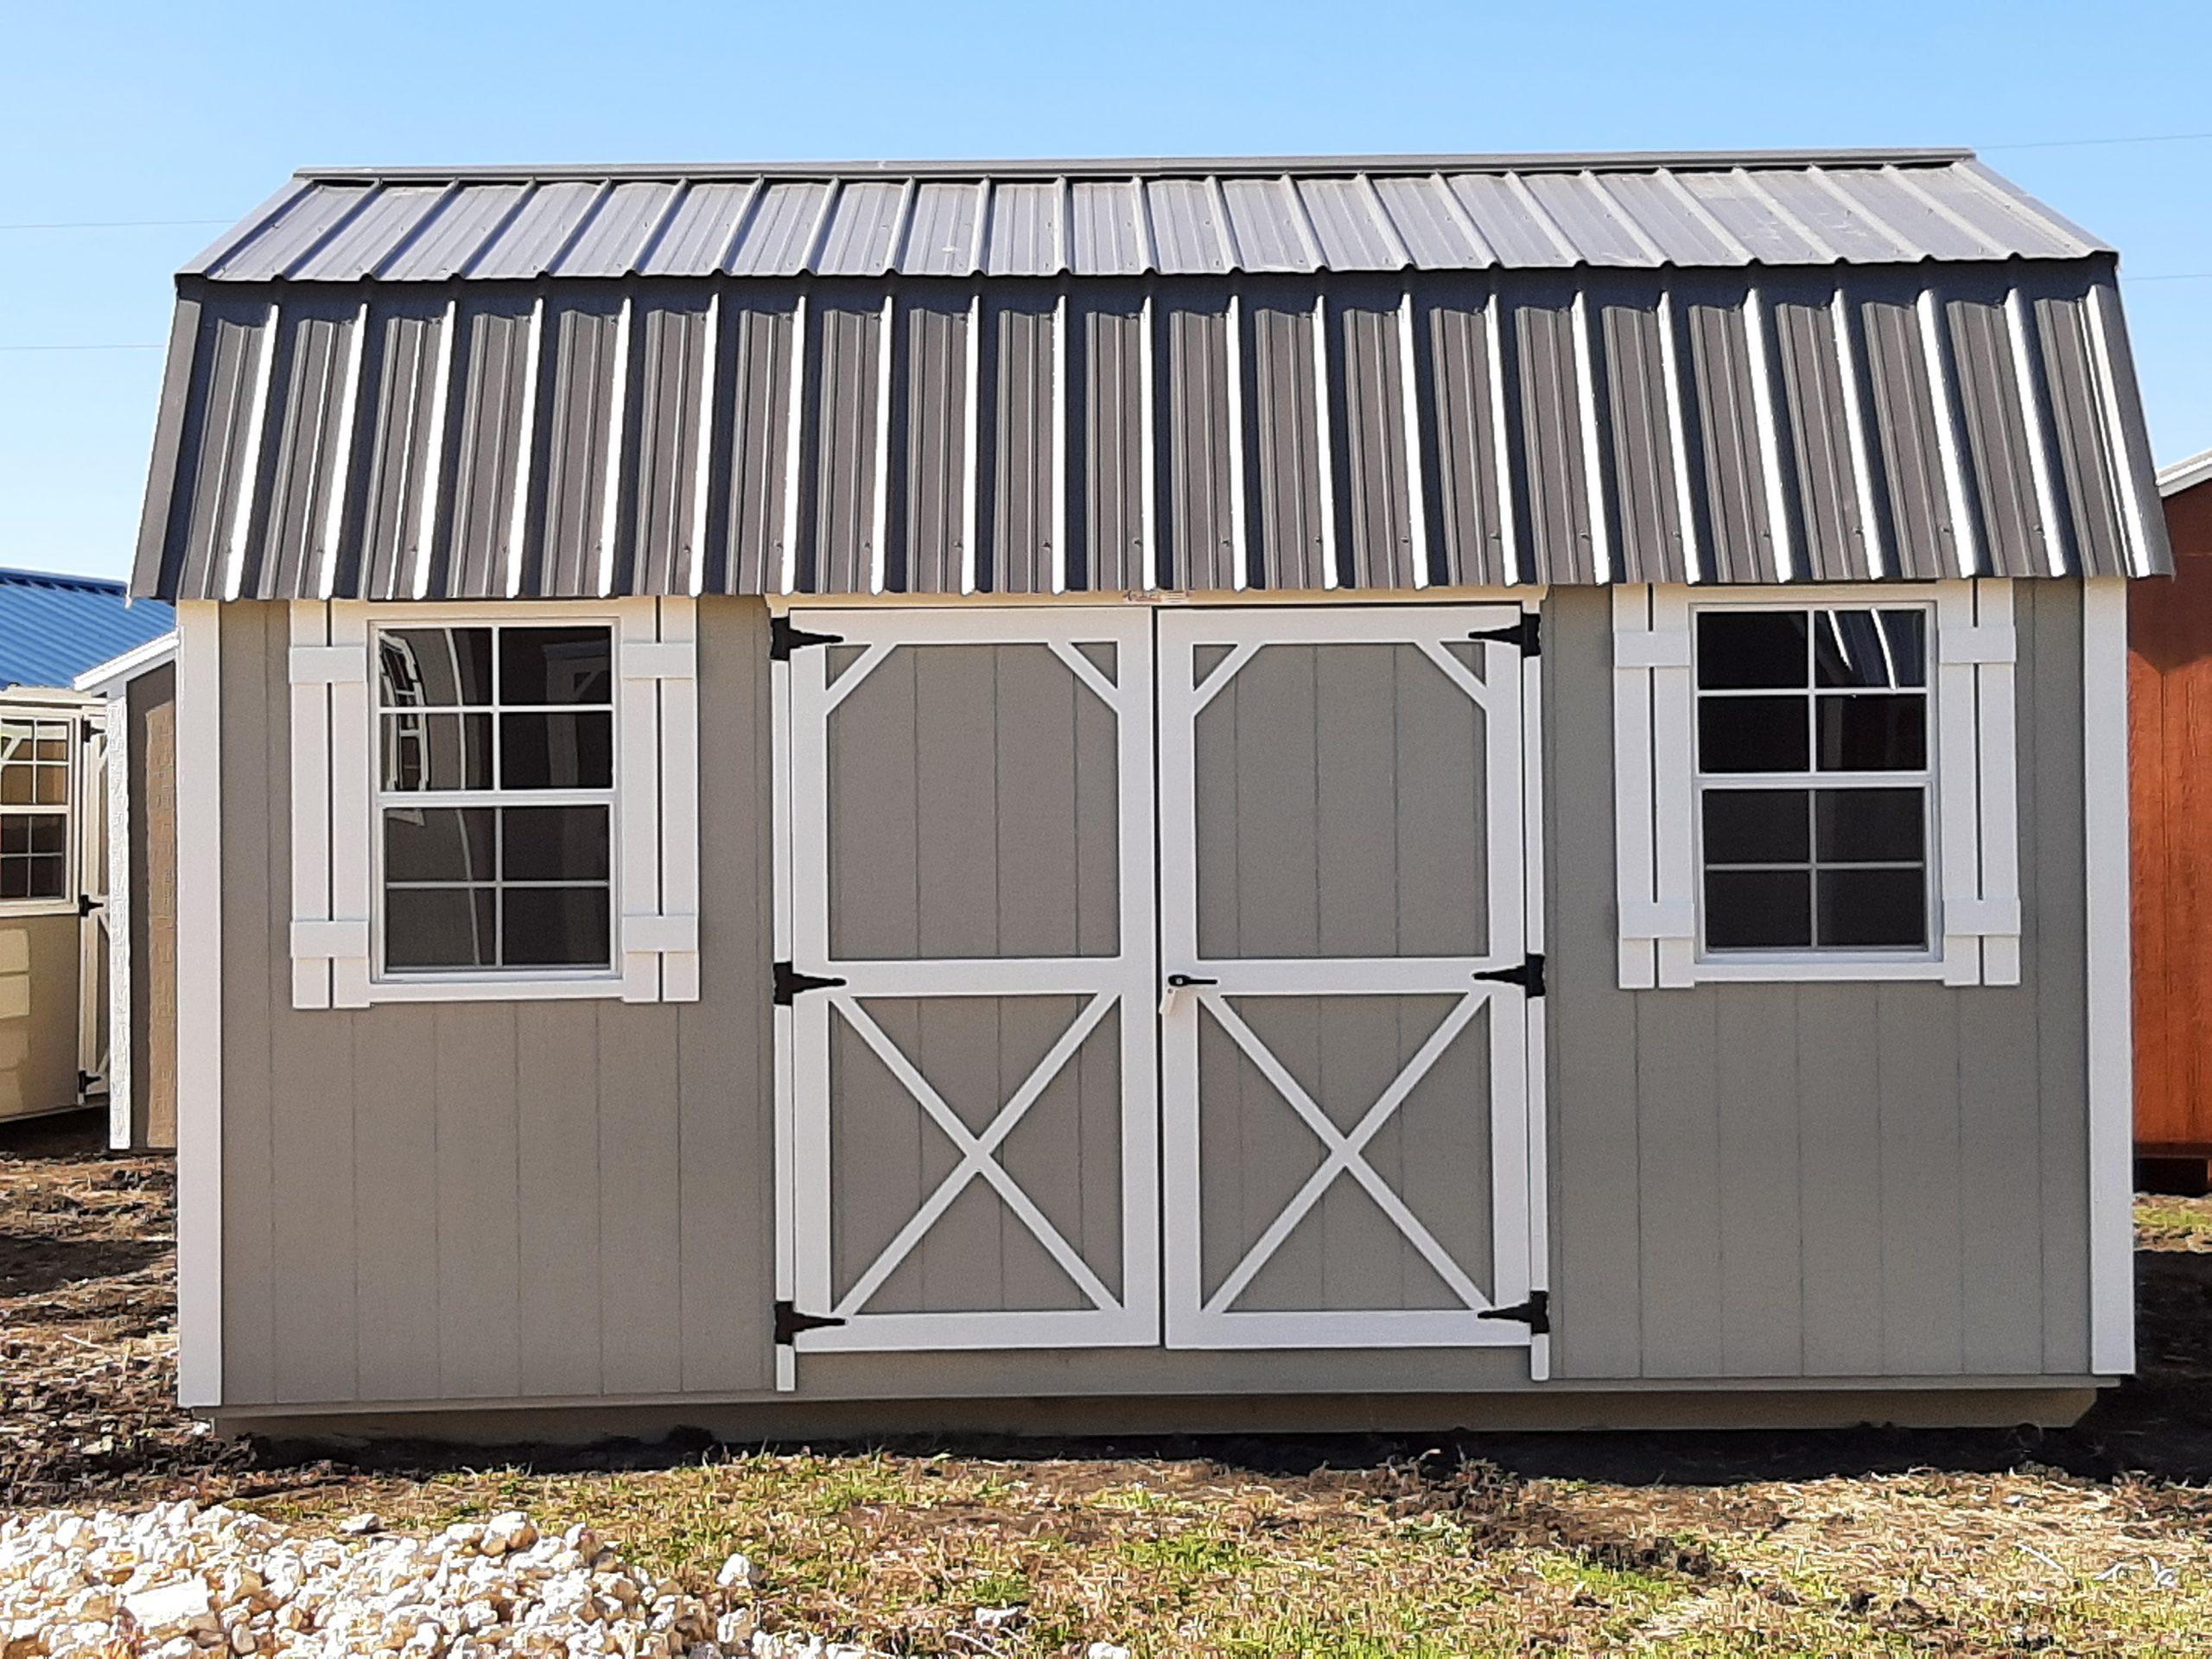 12x16 Elite Lofted Barn Image